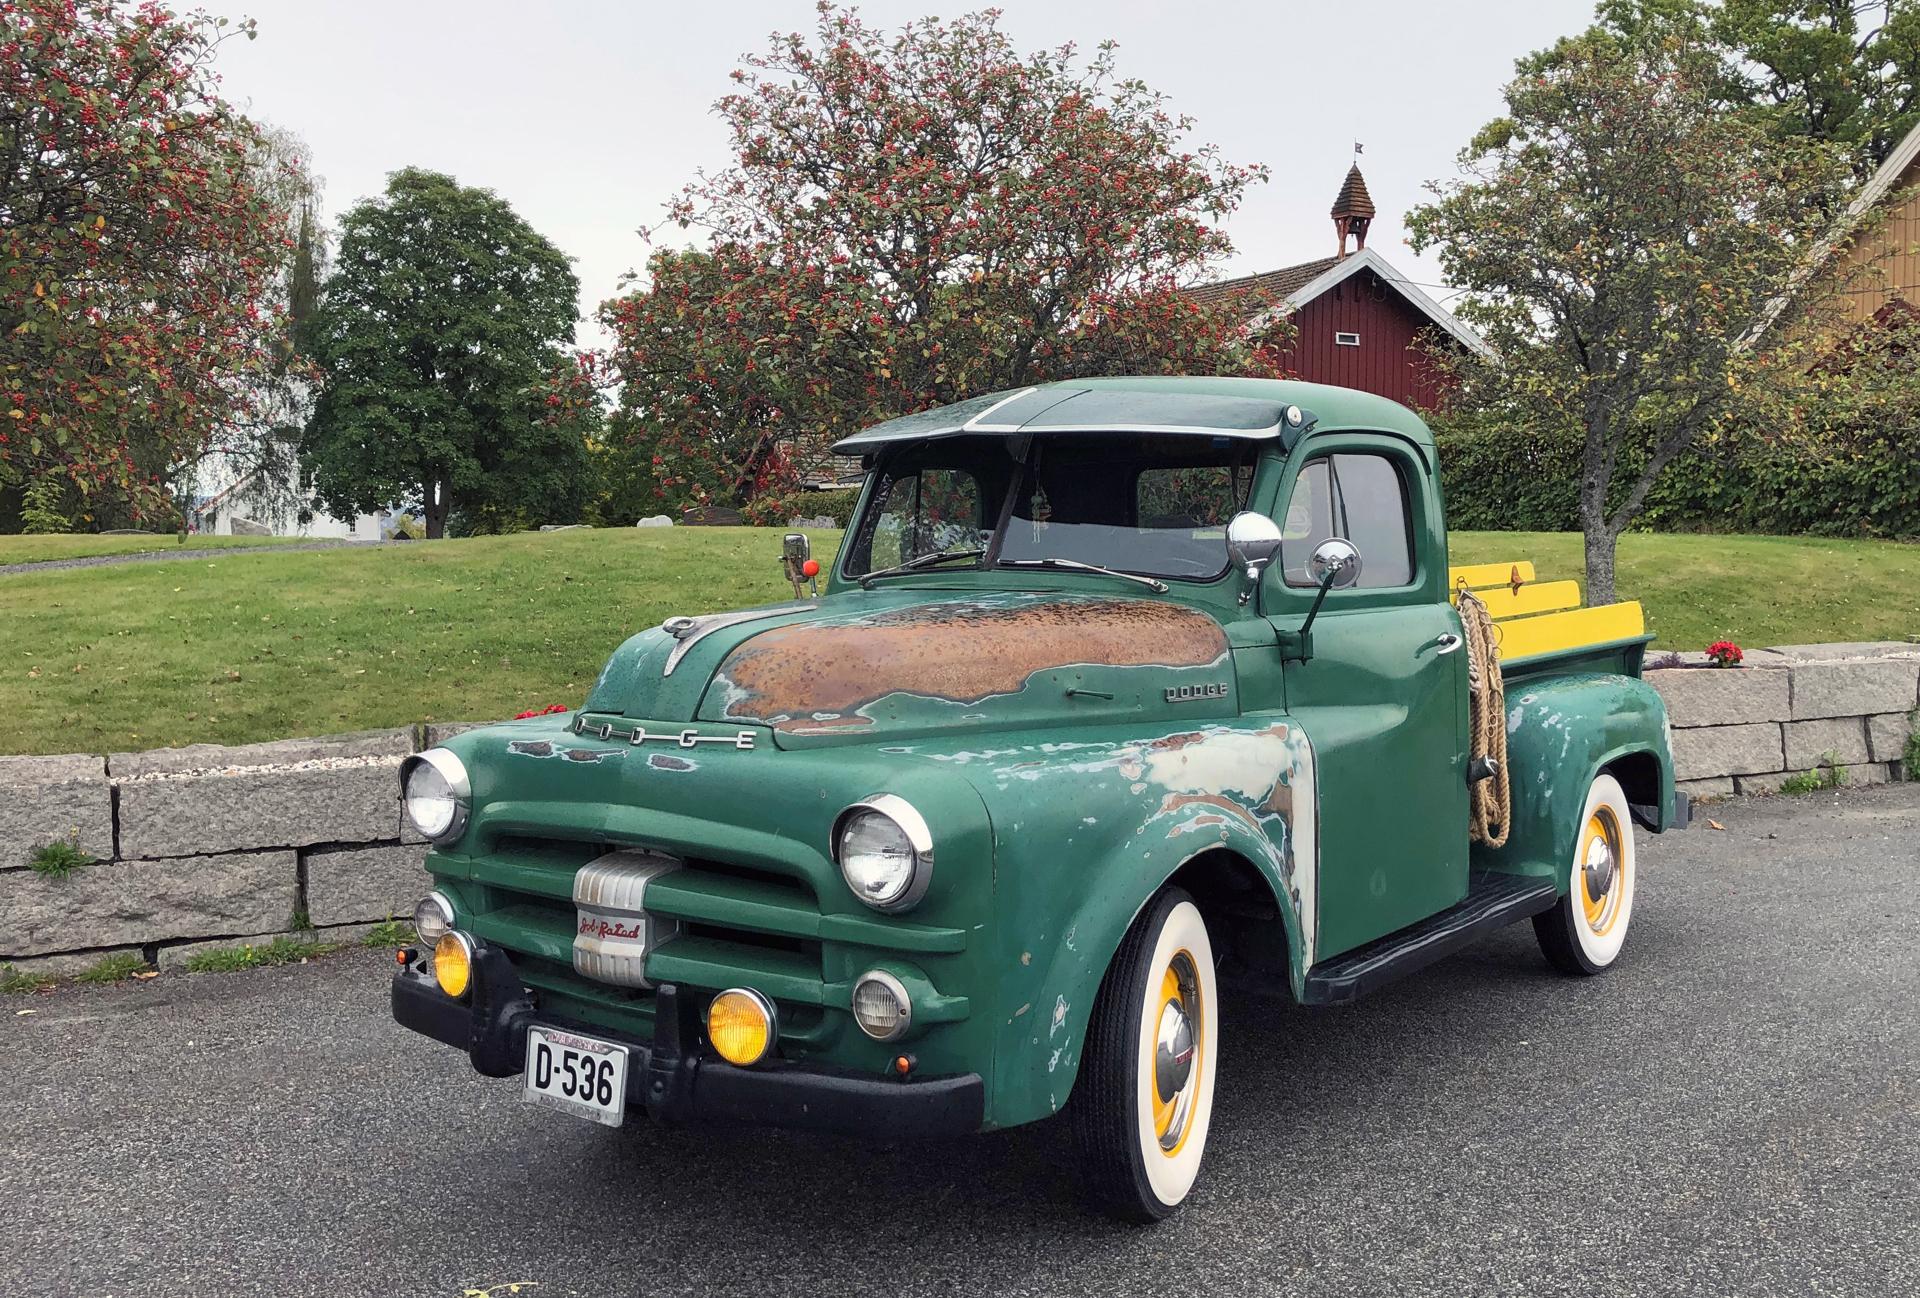 351-1953 Dodge B4B 0,5 t pickup 01. Eier- medlem 3